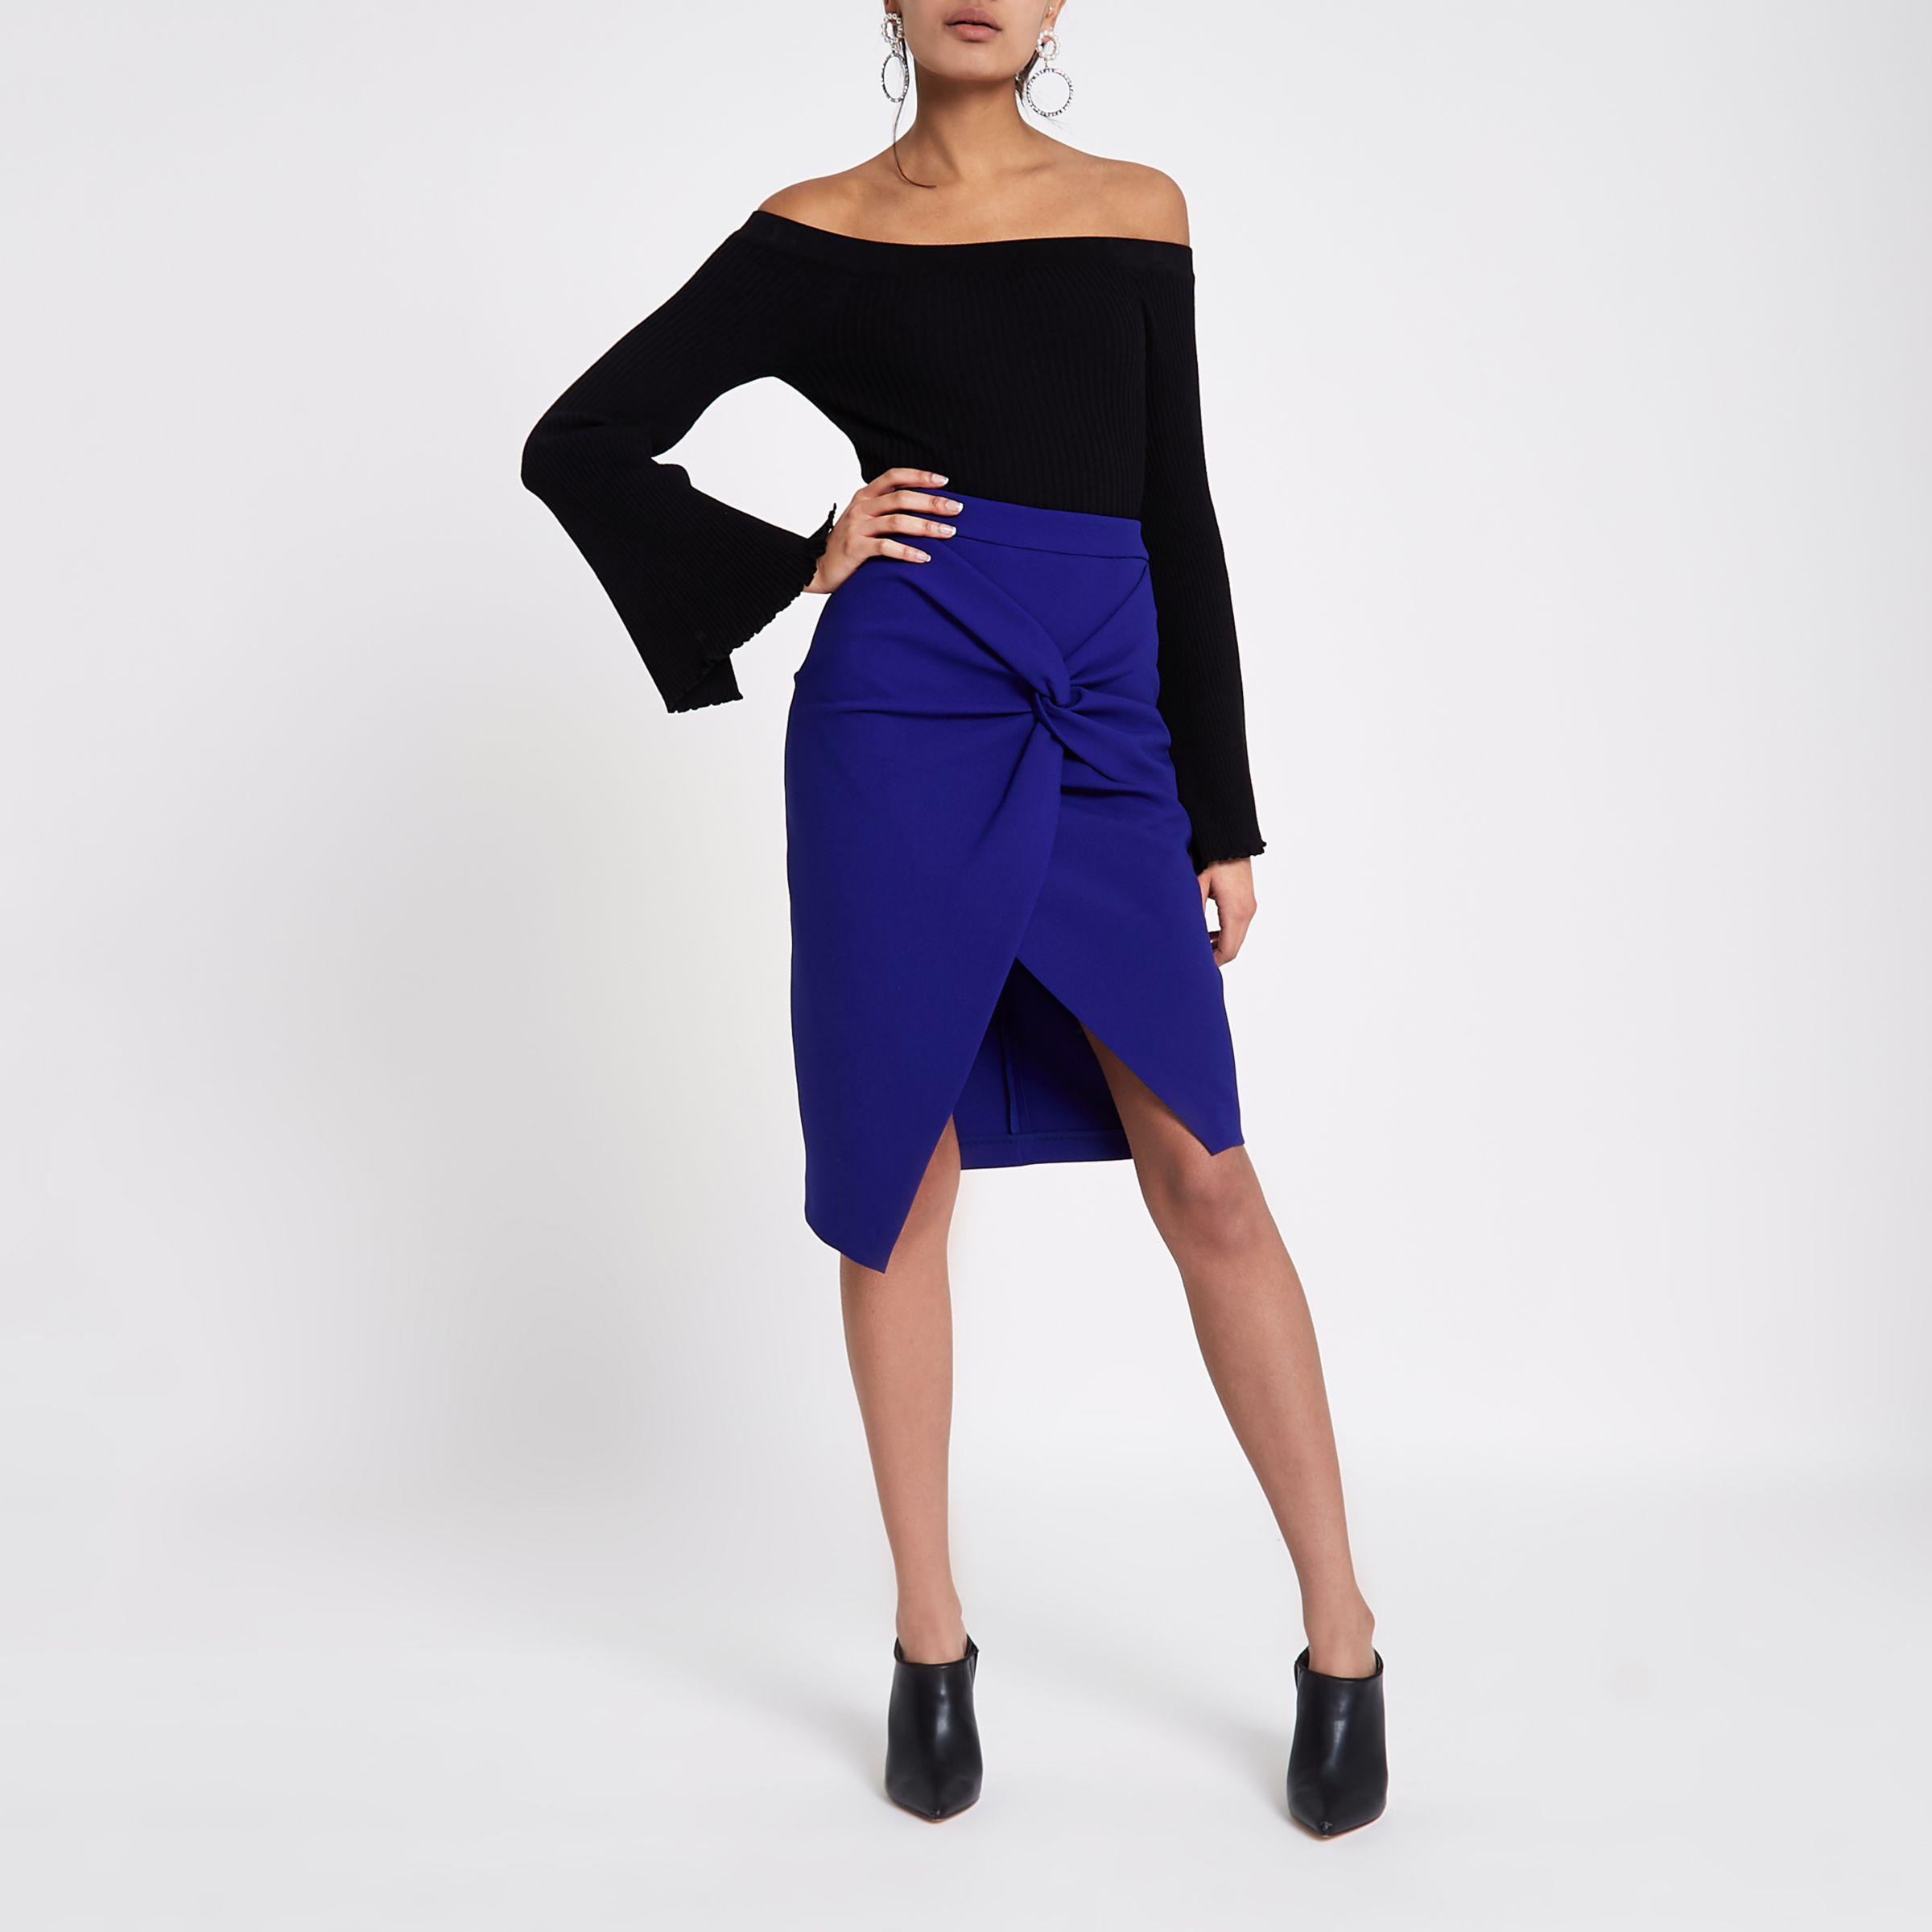 b276e3564 River Island Blue Twist Front Pencil Skirt in Blue - Lyst